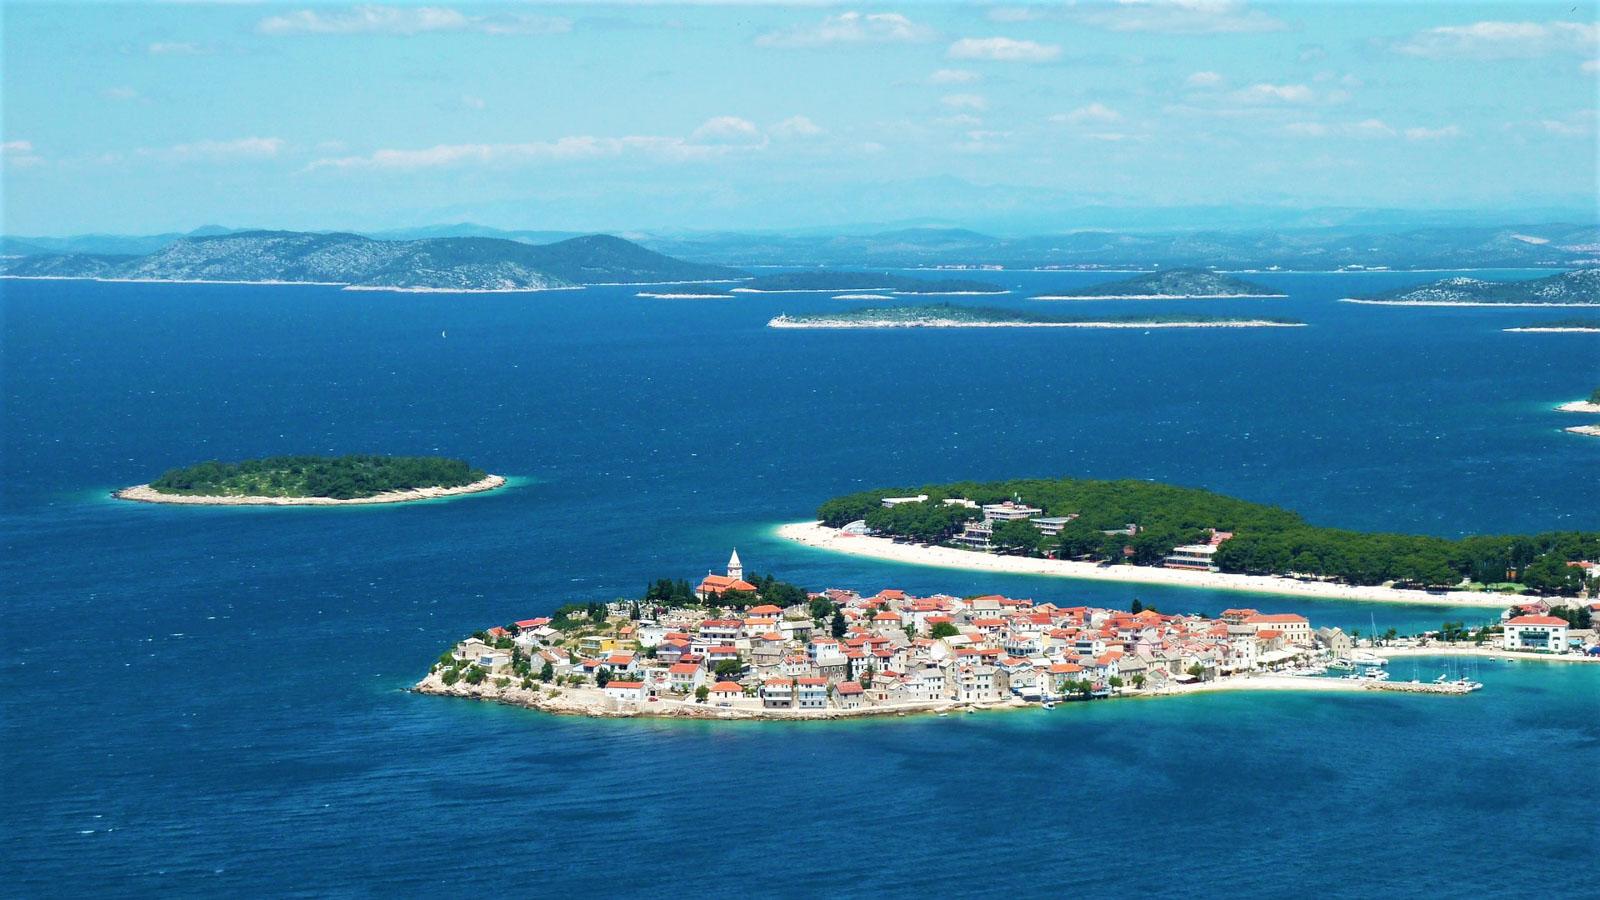 Яхтенный маршрут по центральной Хорватии. Примоштен